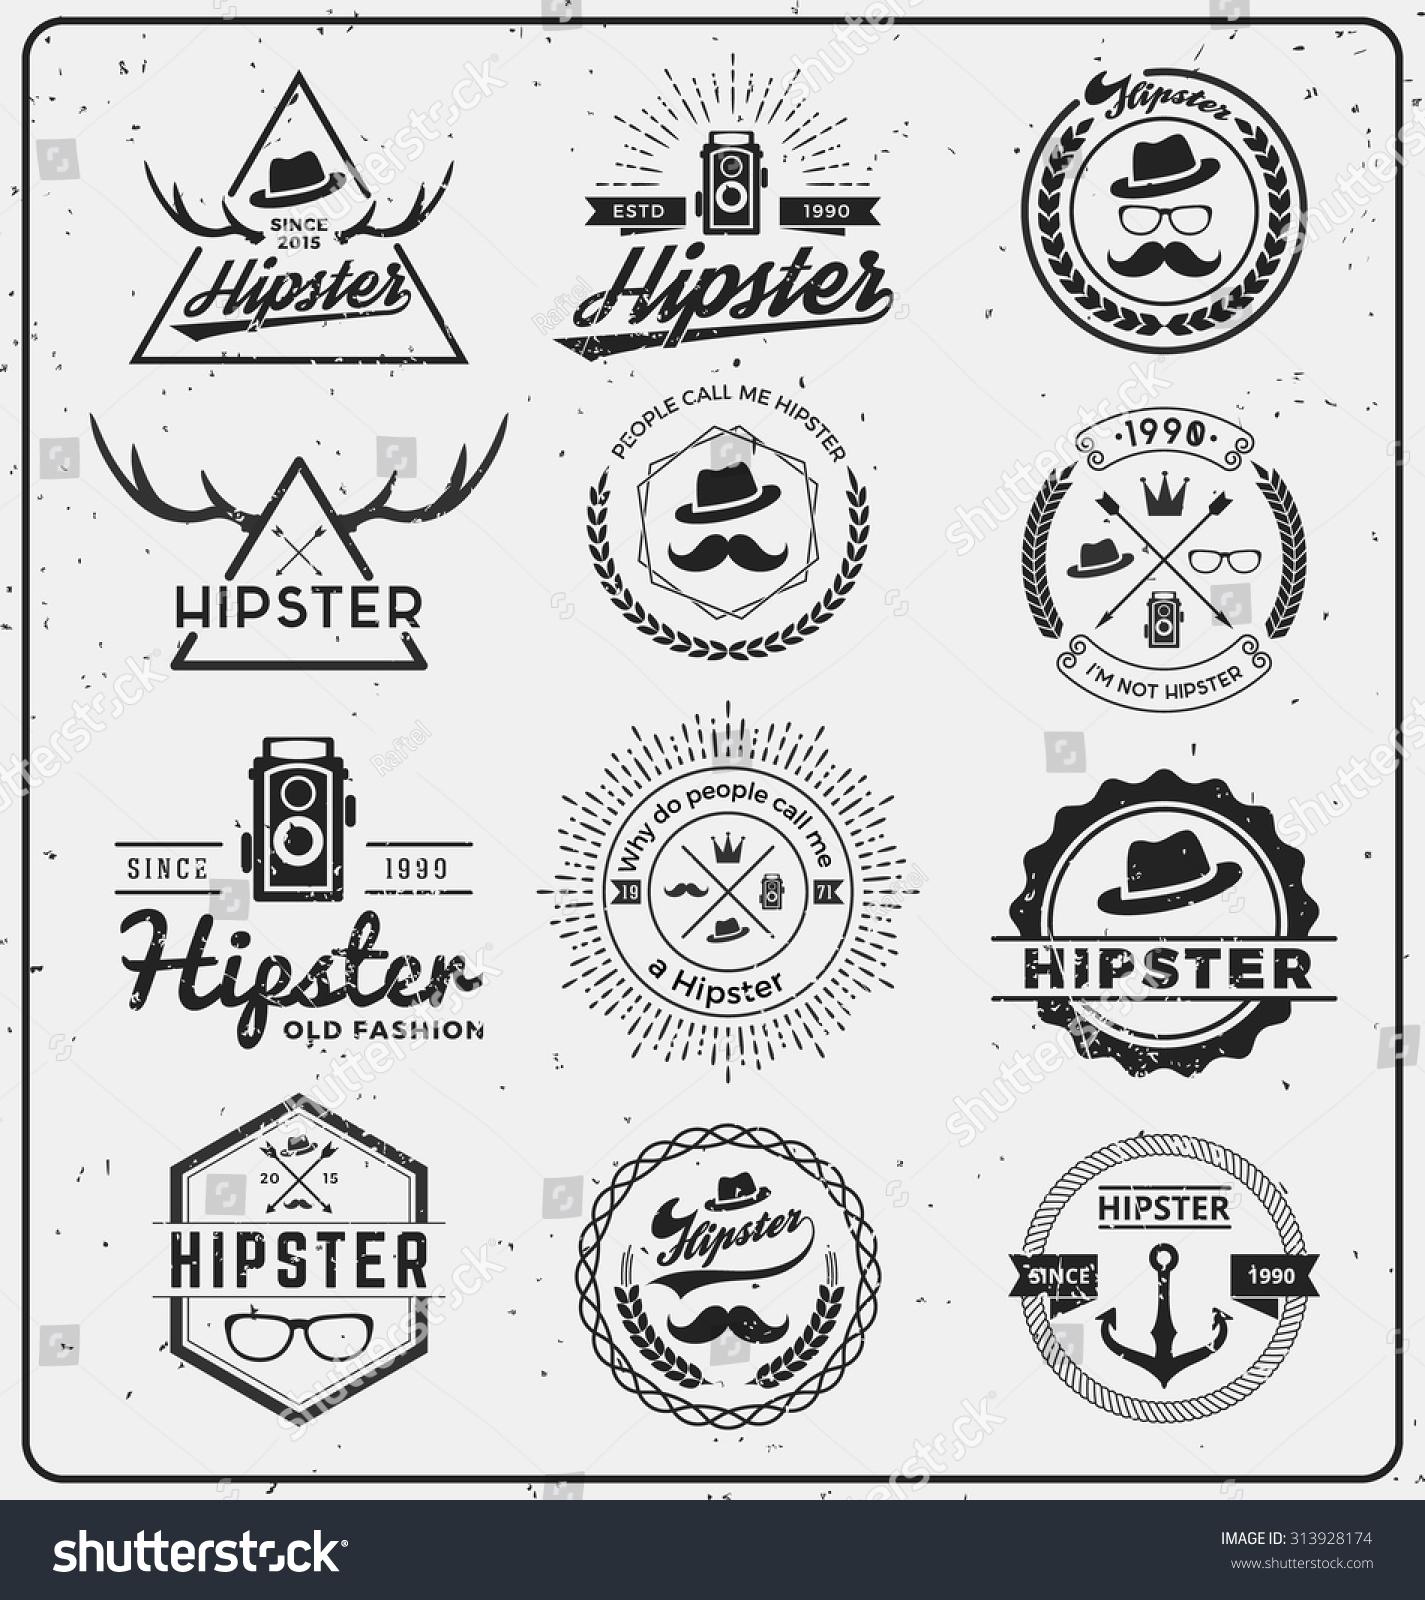 Set hipster insignia logo design logo stock vector for Logos for t shirts printing